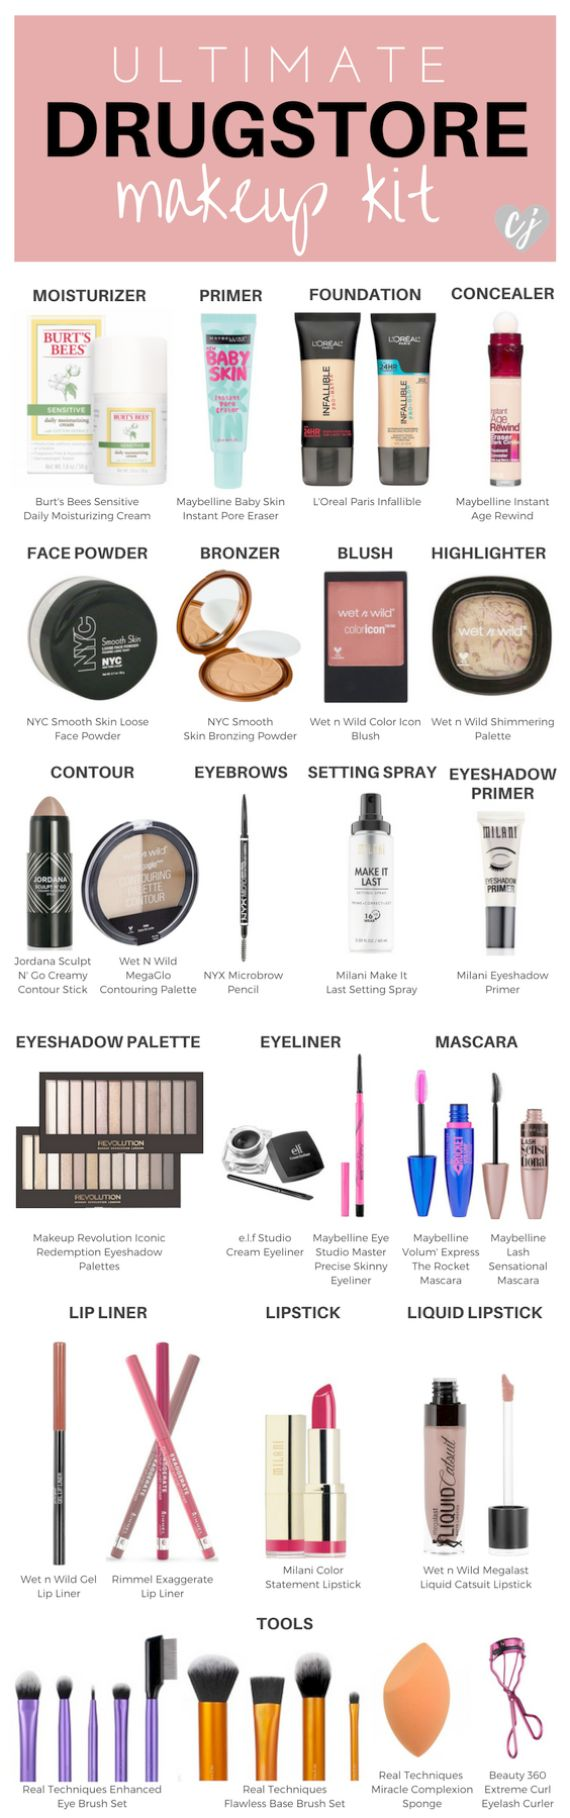 Makeup Accessories Canada Makeup Tools Pictures Skin